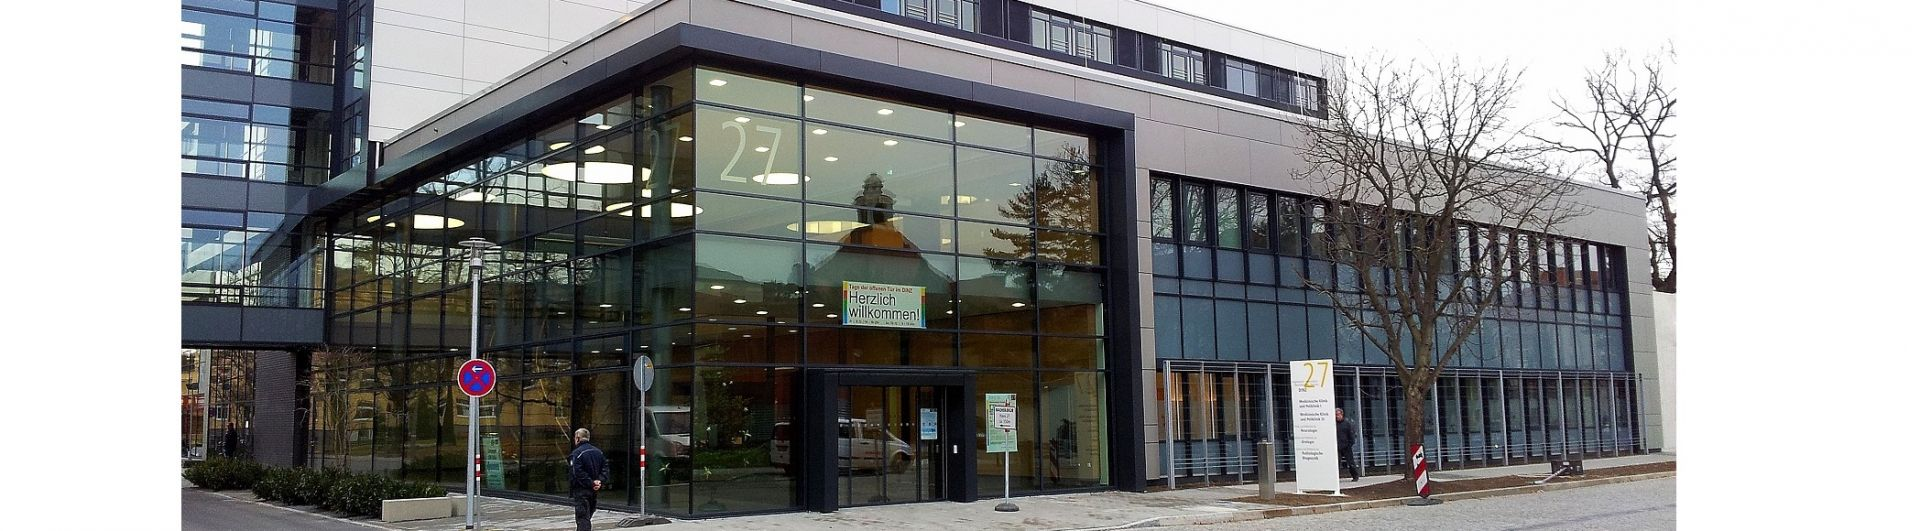 Medizinische Klinik und Poliklinik III am Universitätsklinikum Carl Gustav Carus